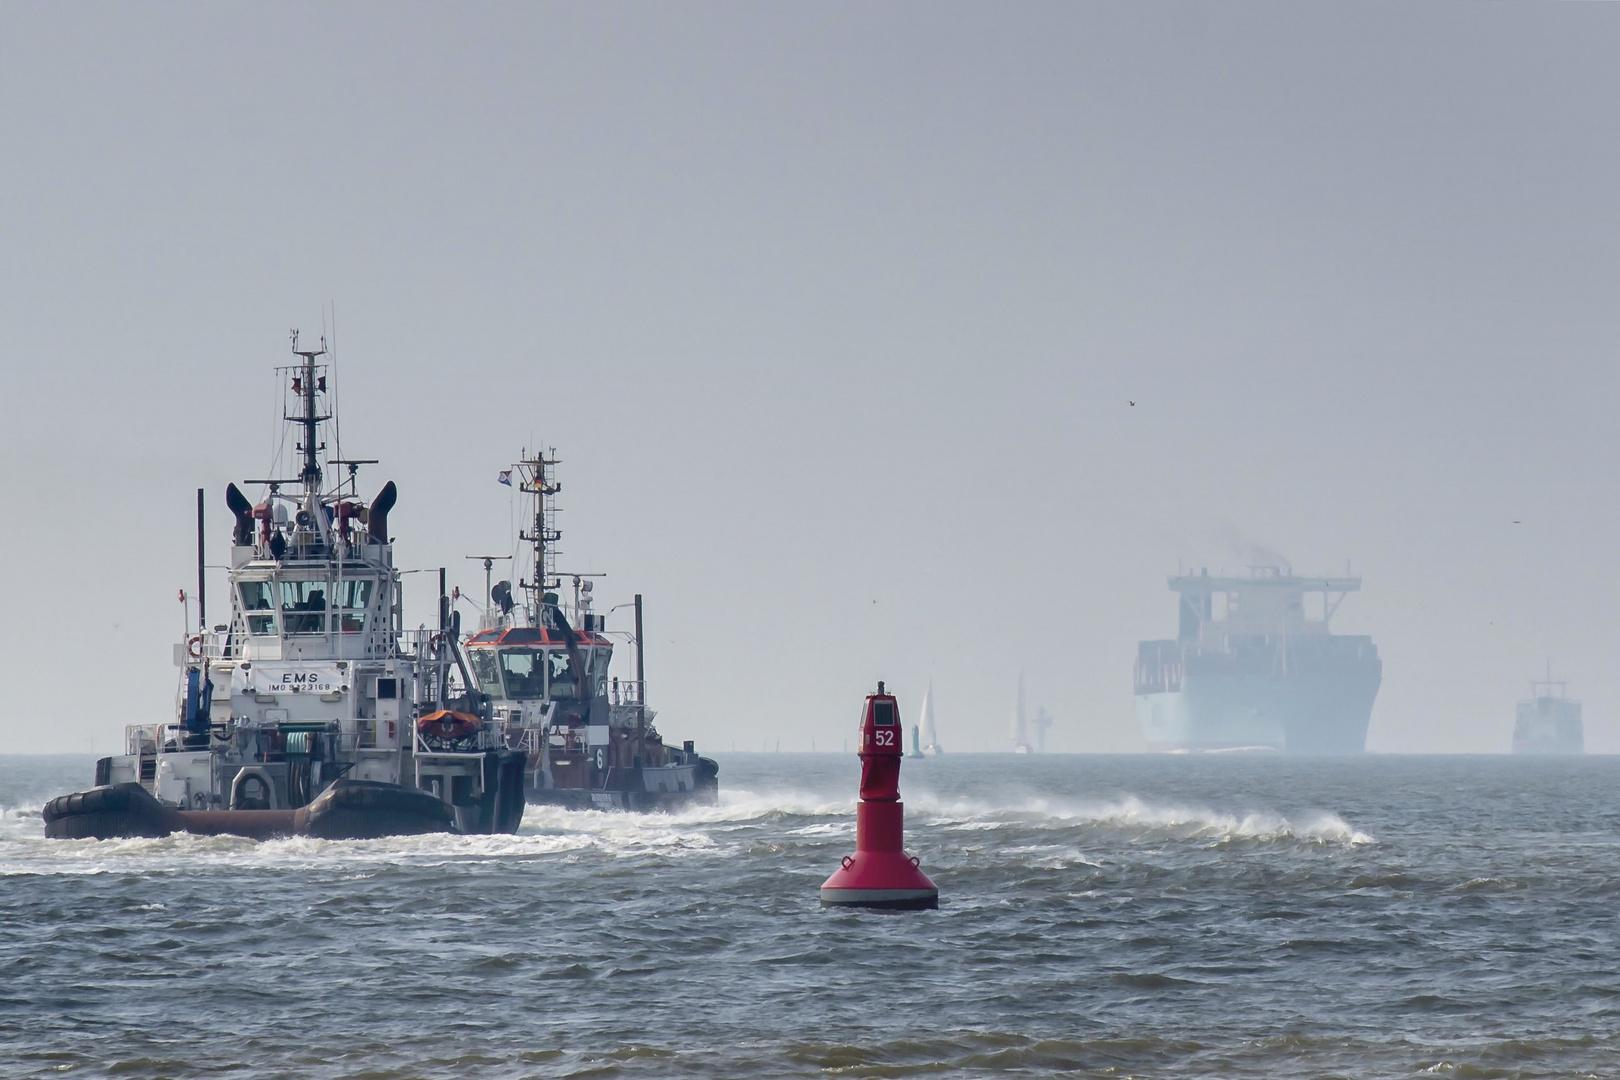 Maersk Mc-Kinney Möller auf dem Weg nach Bremerhaven